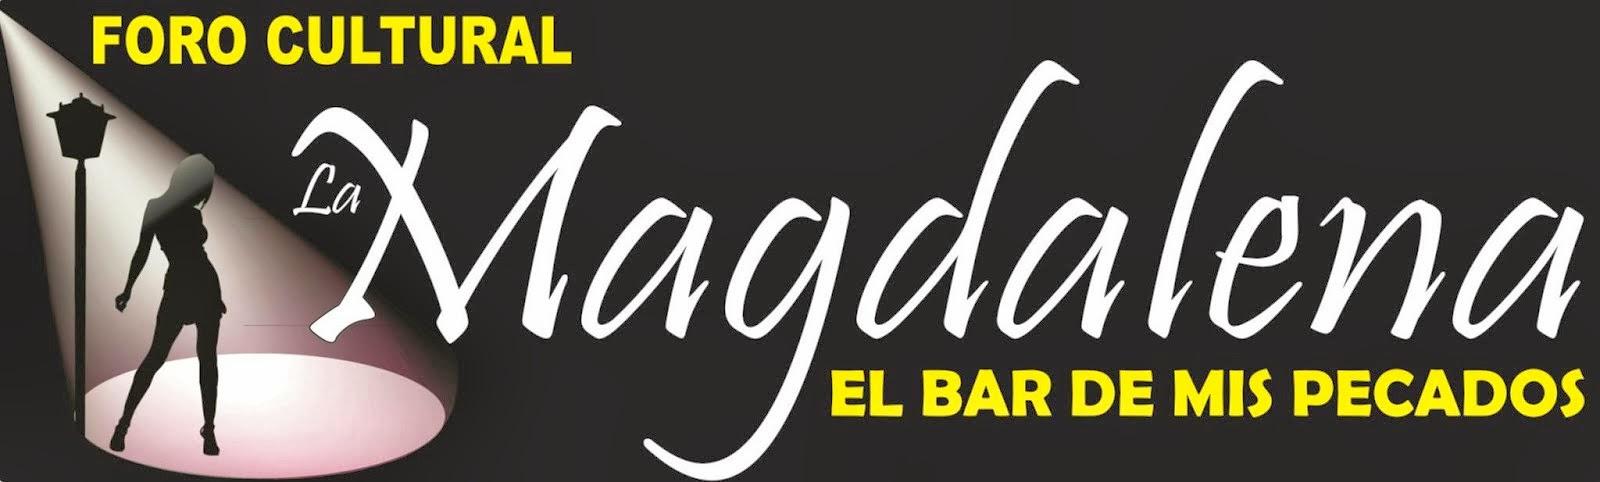 Foro La Magdalena